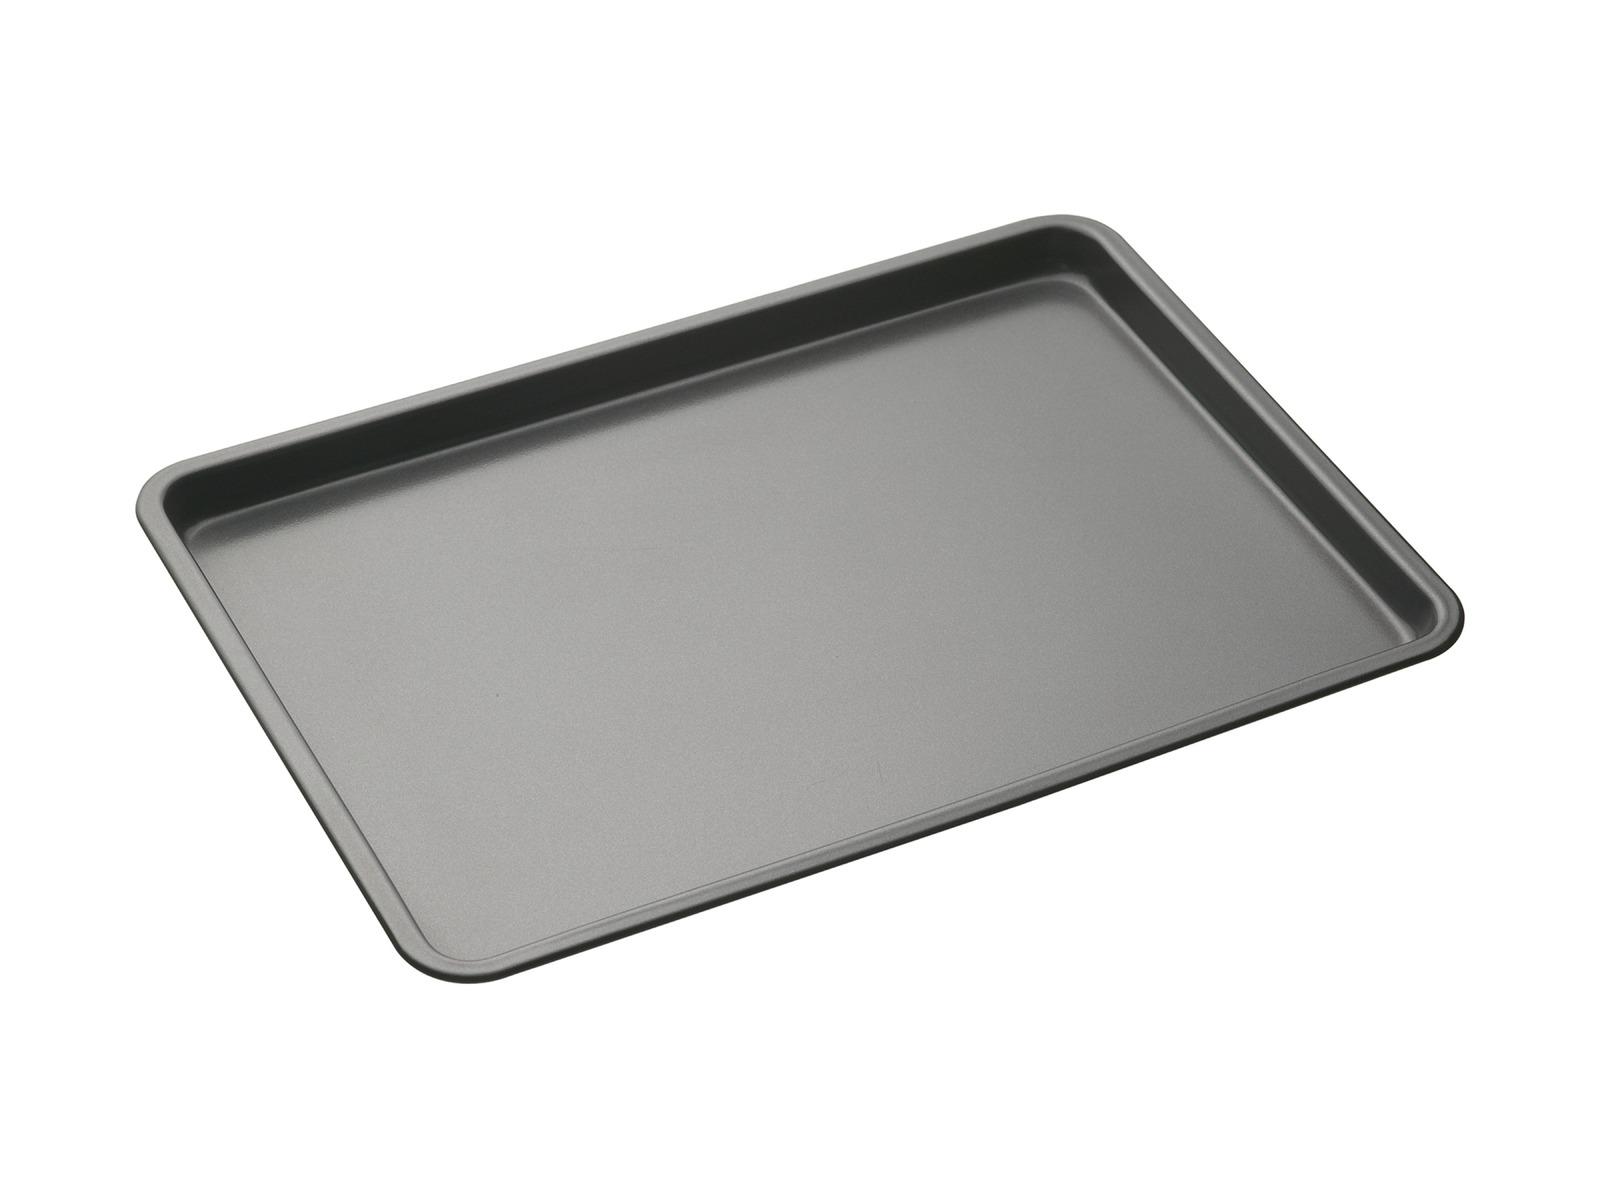 MasterClass: Non-Stick Bake Tray (35x25cm) image